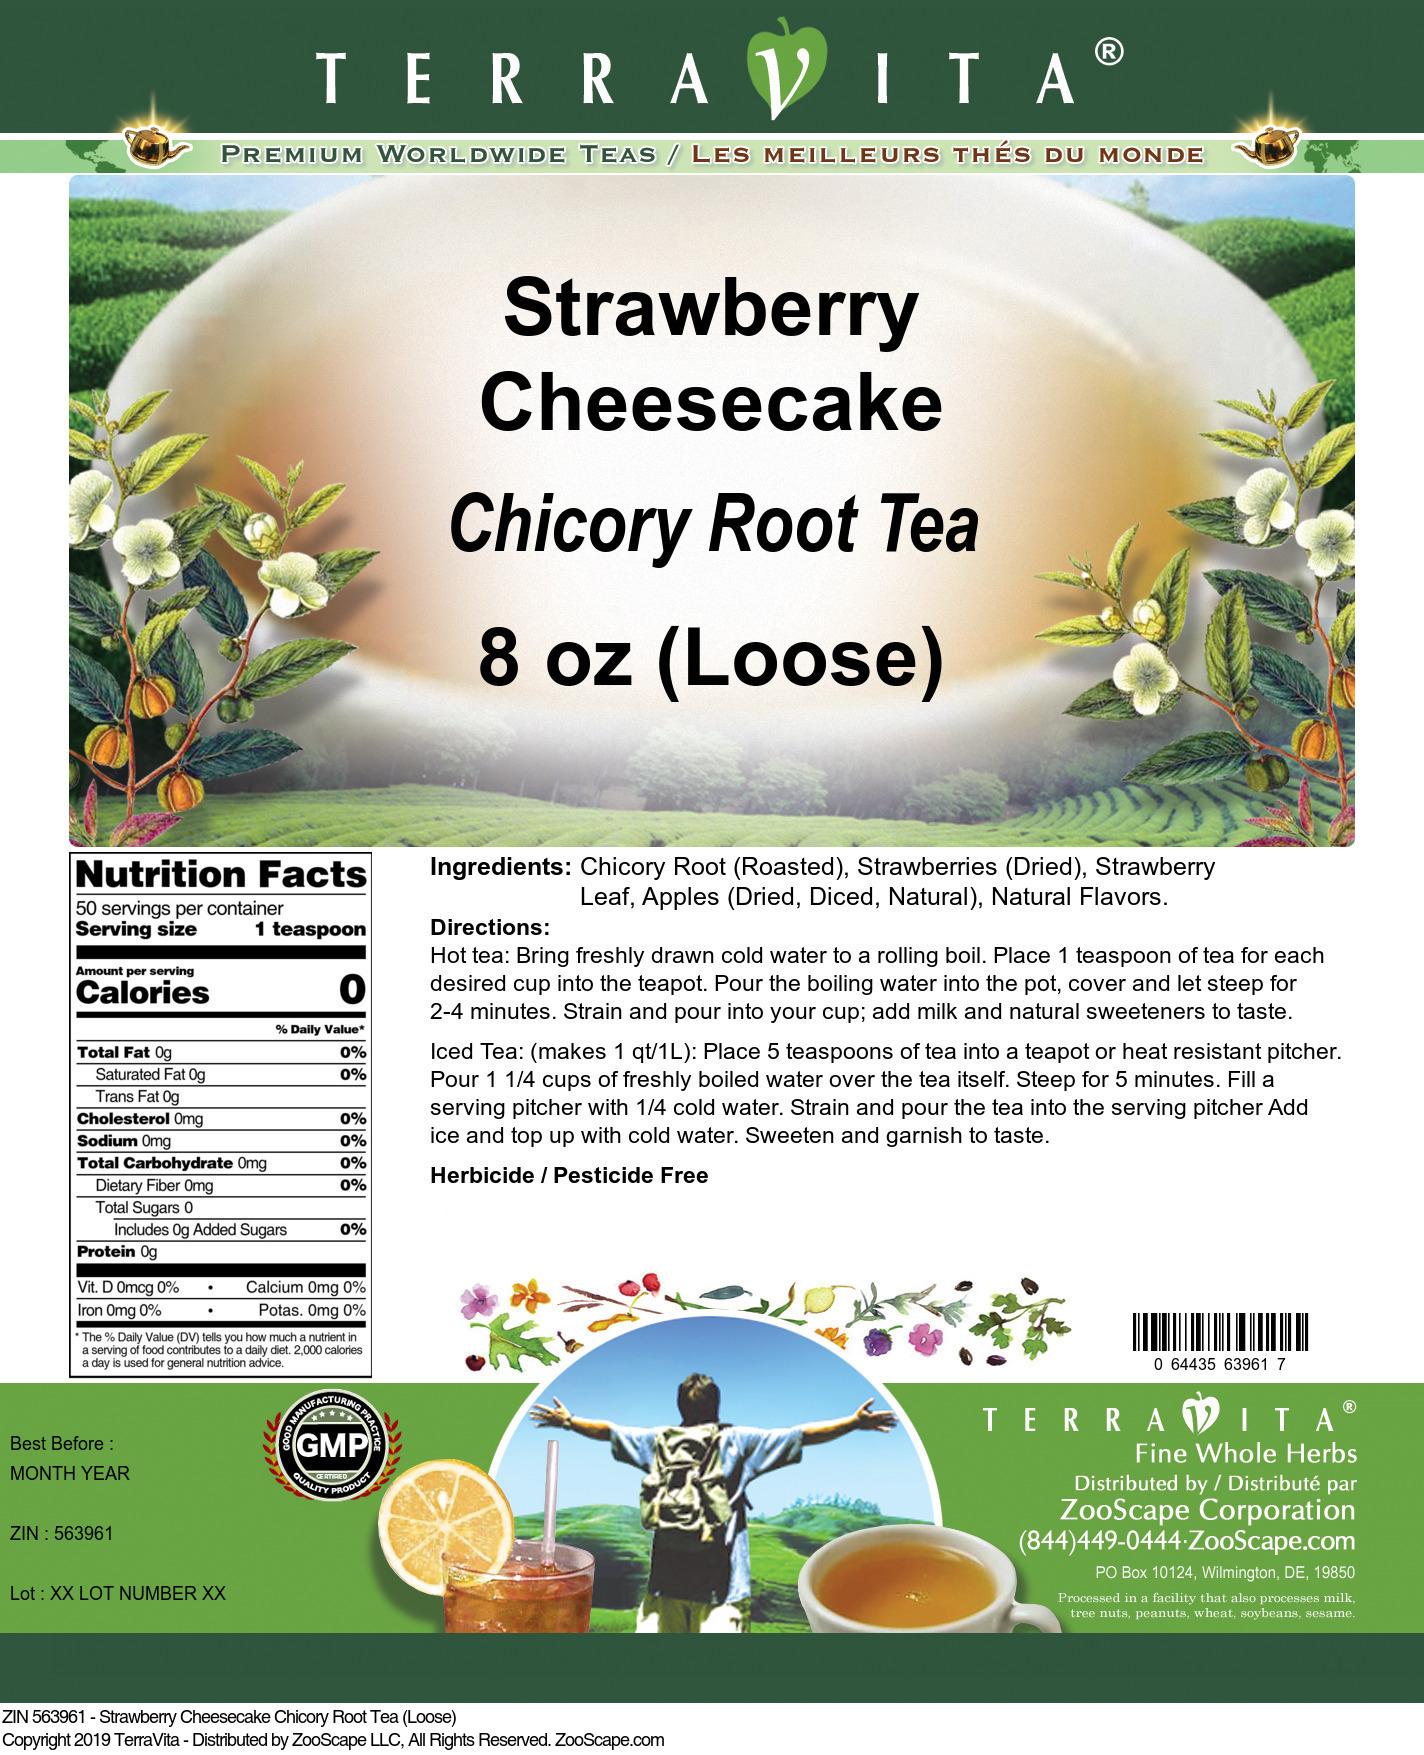 Strawberry Cheesecake Chicory Root Tea (Loose)